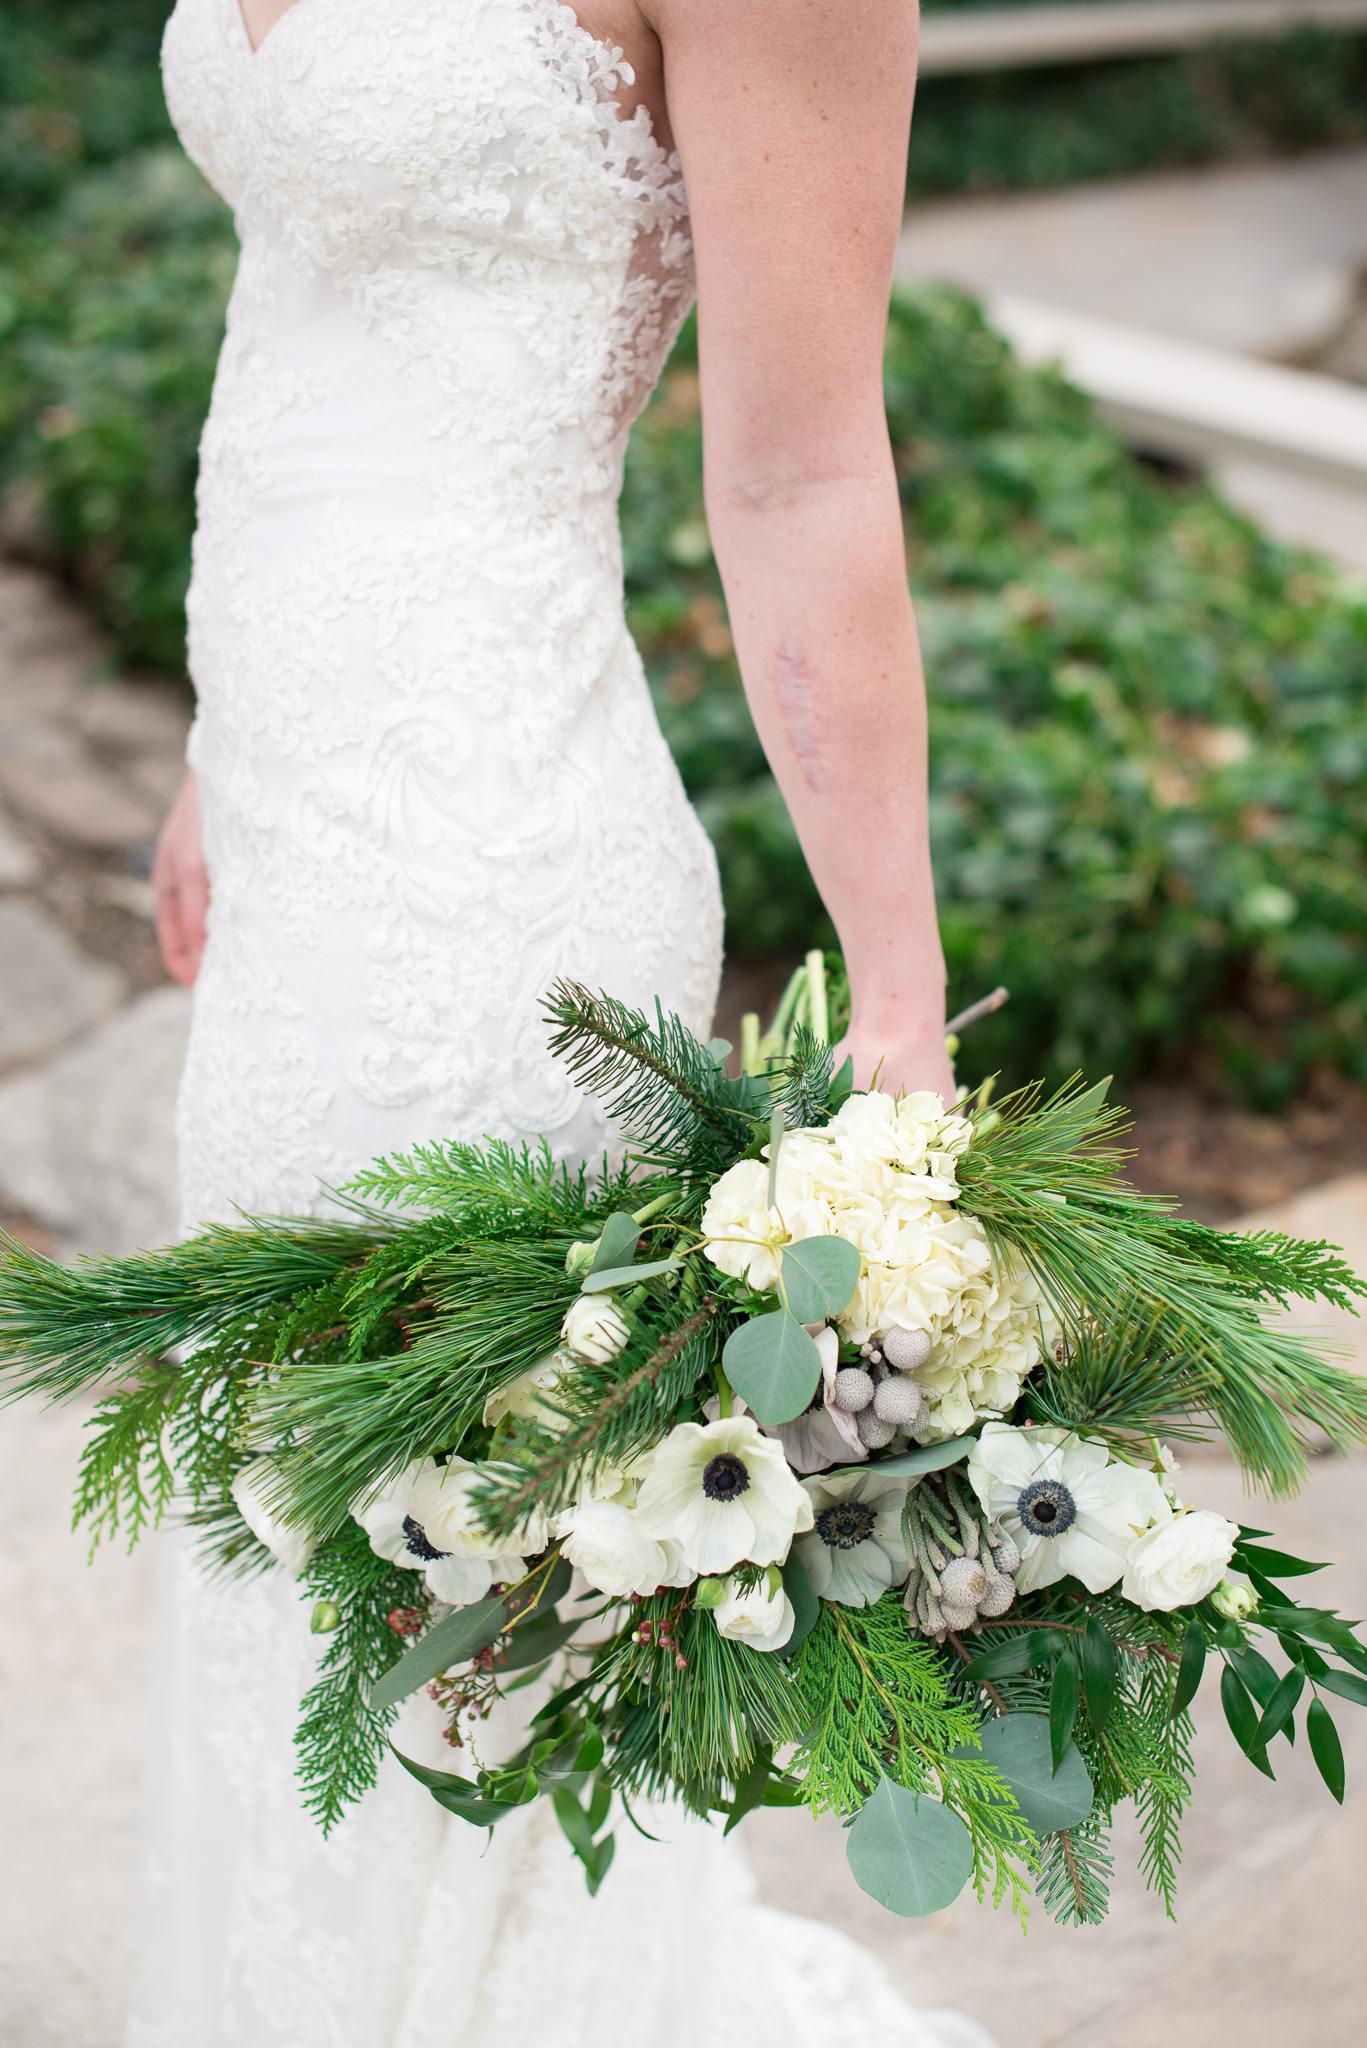 Trevor-Hooper-Wedding-Photographer-The-Bungalow-Wedding-Utah_CLR_039.jpg